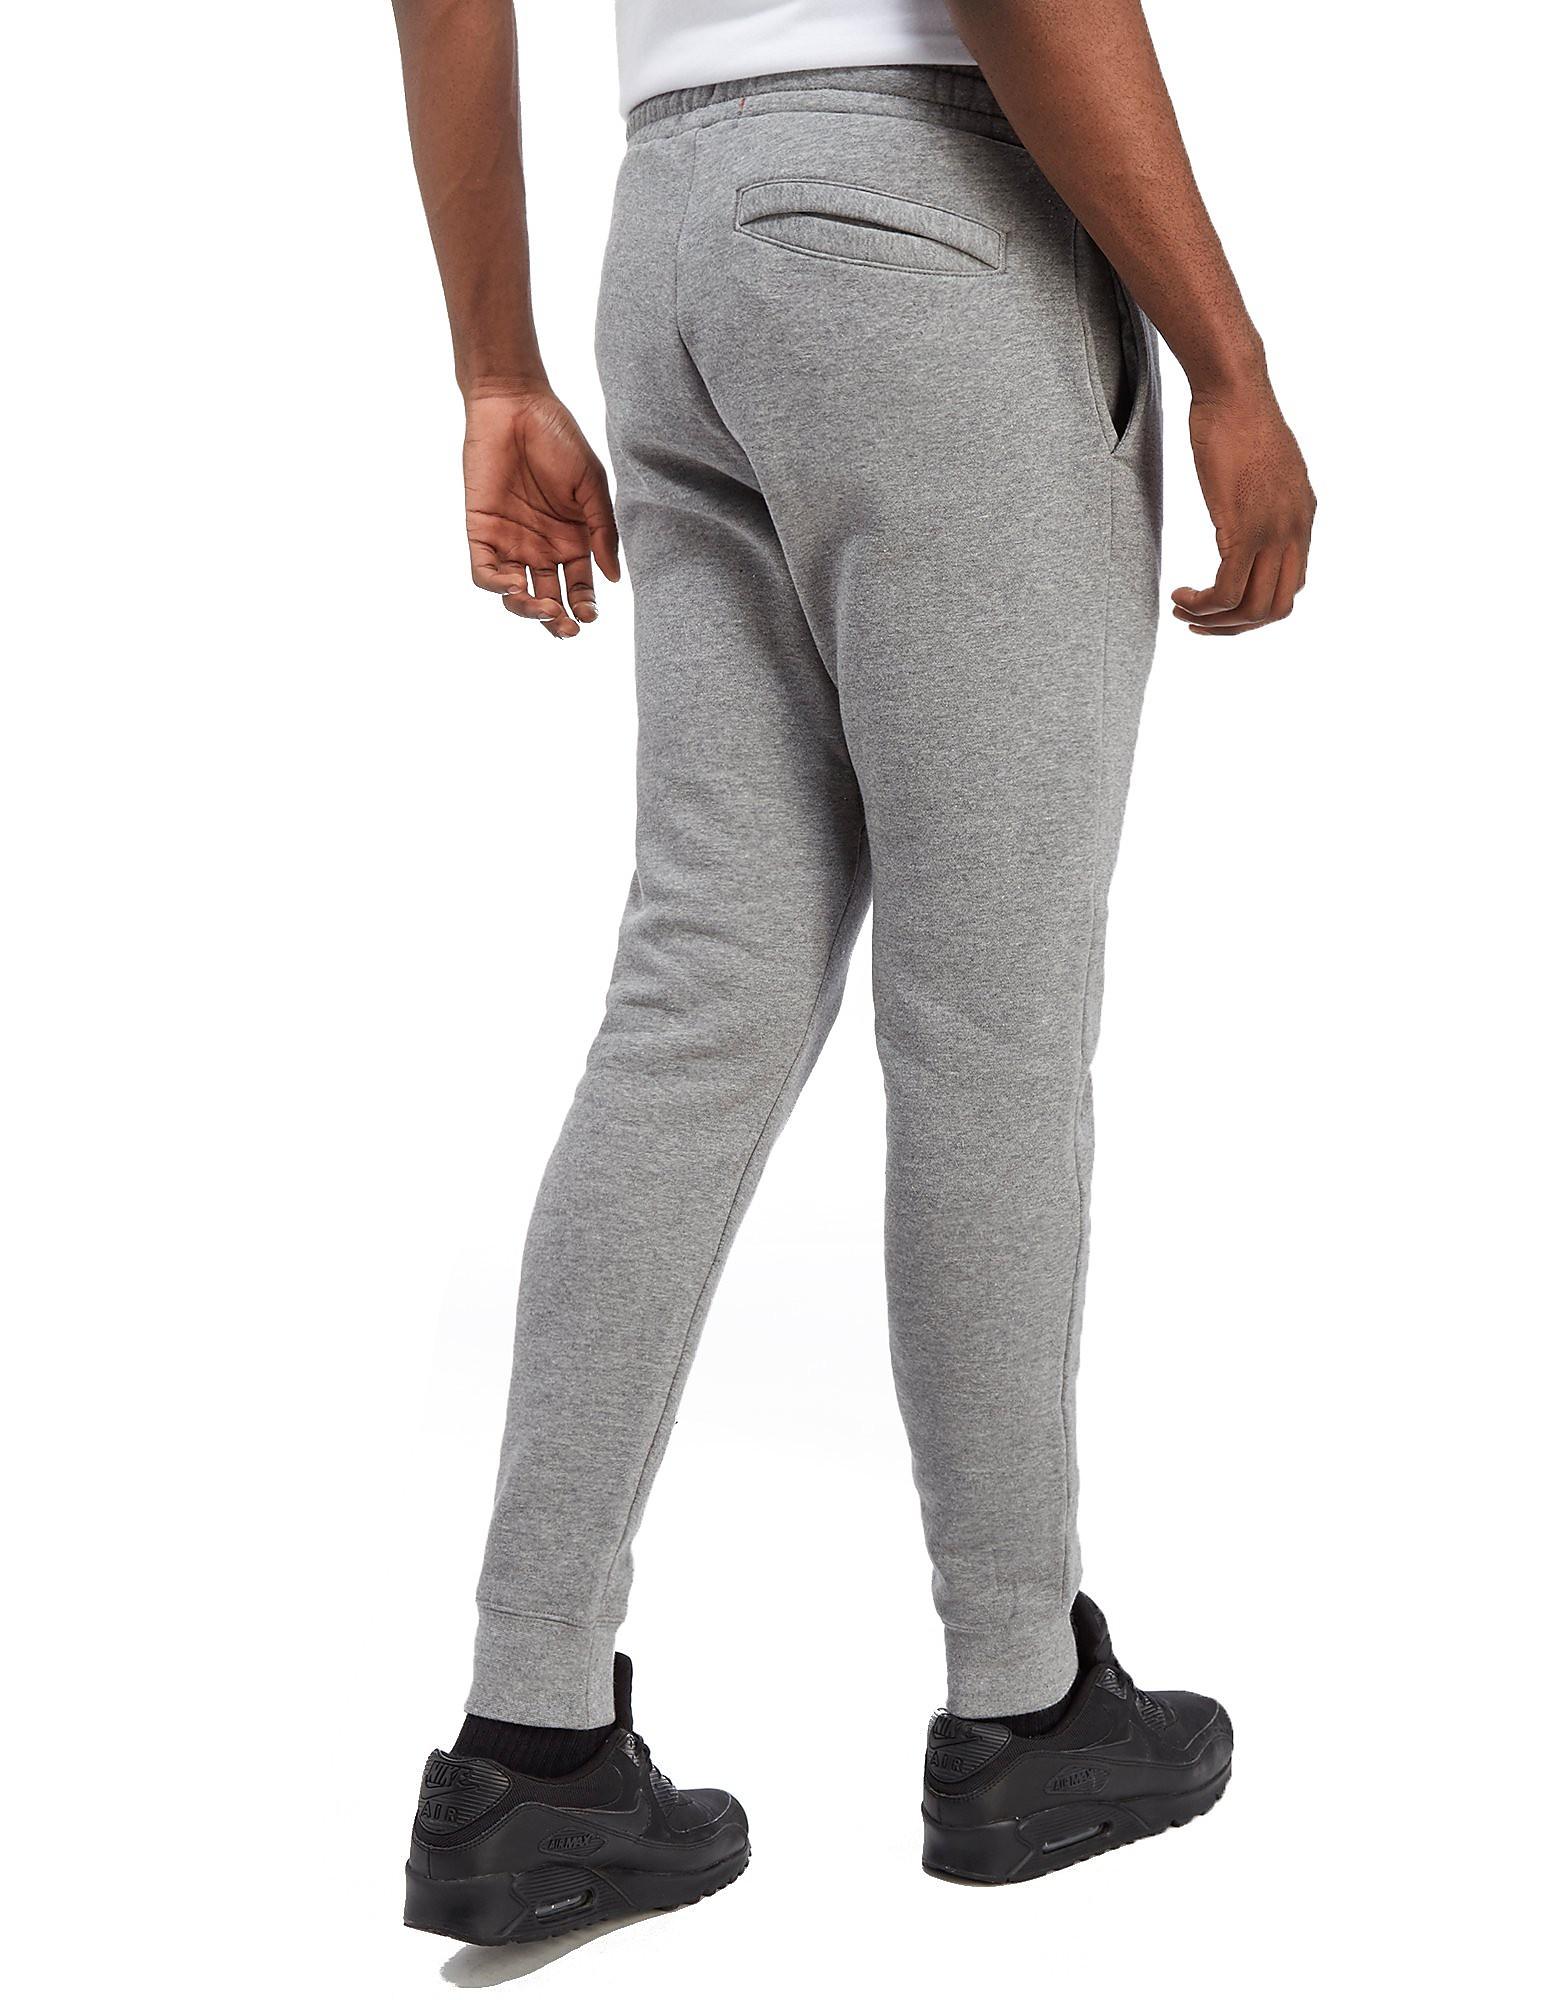 Nike Air Hybrid Jogging Pants